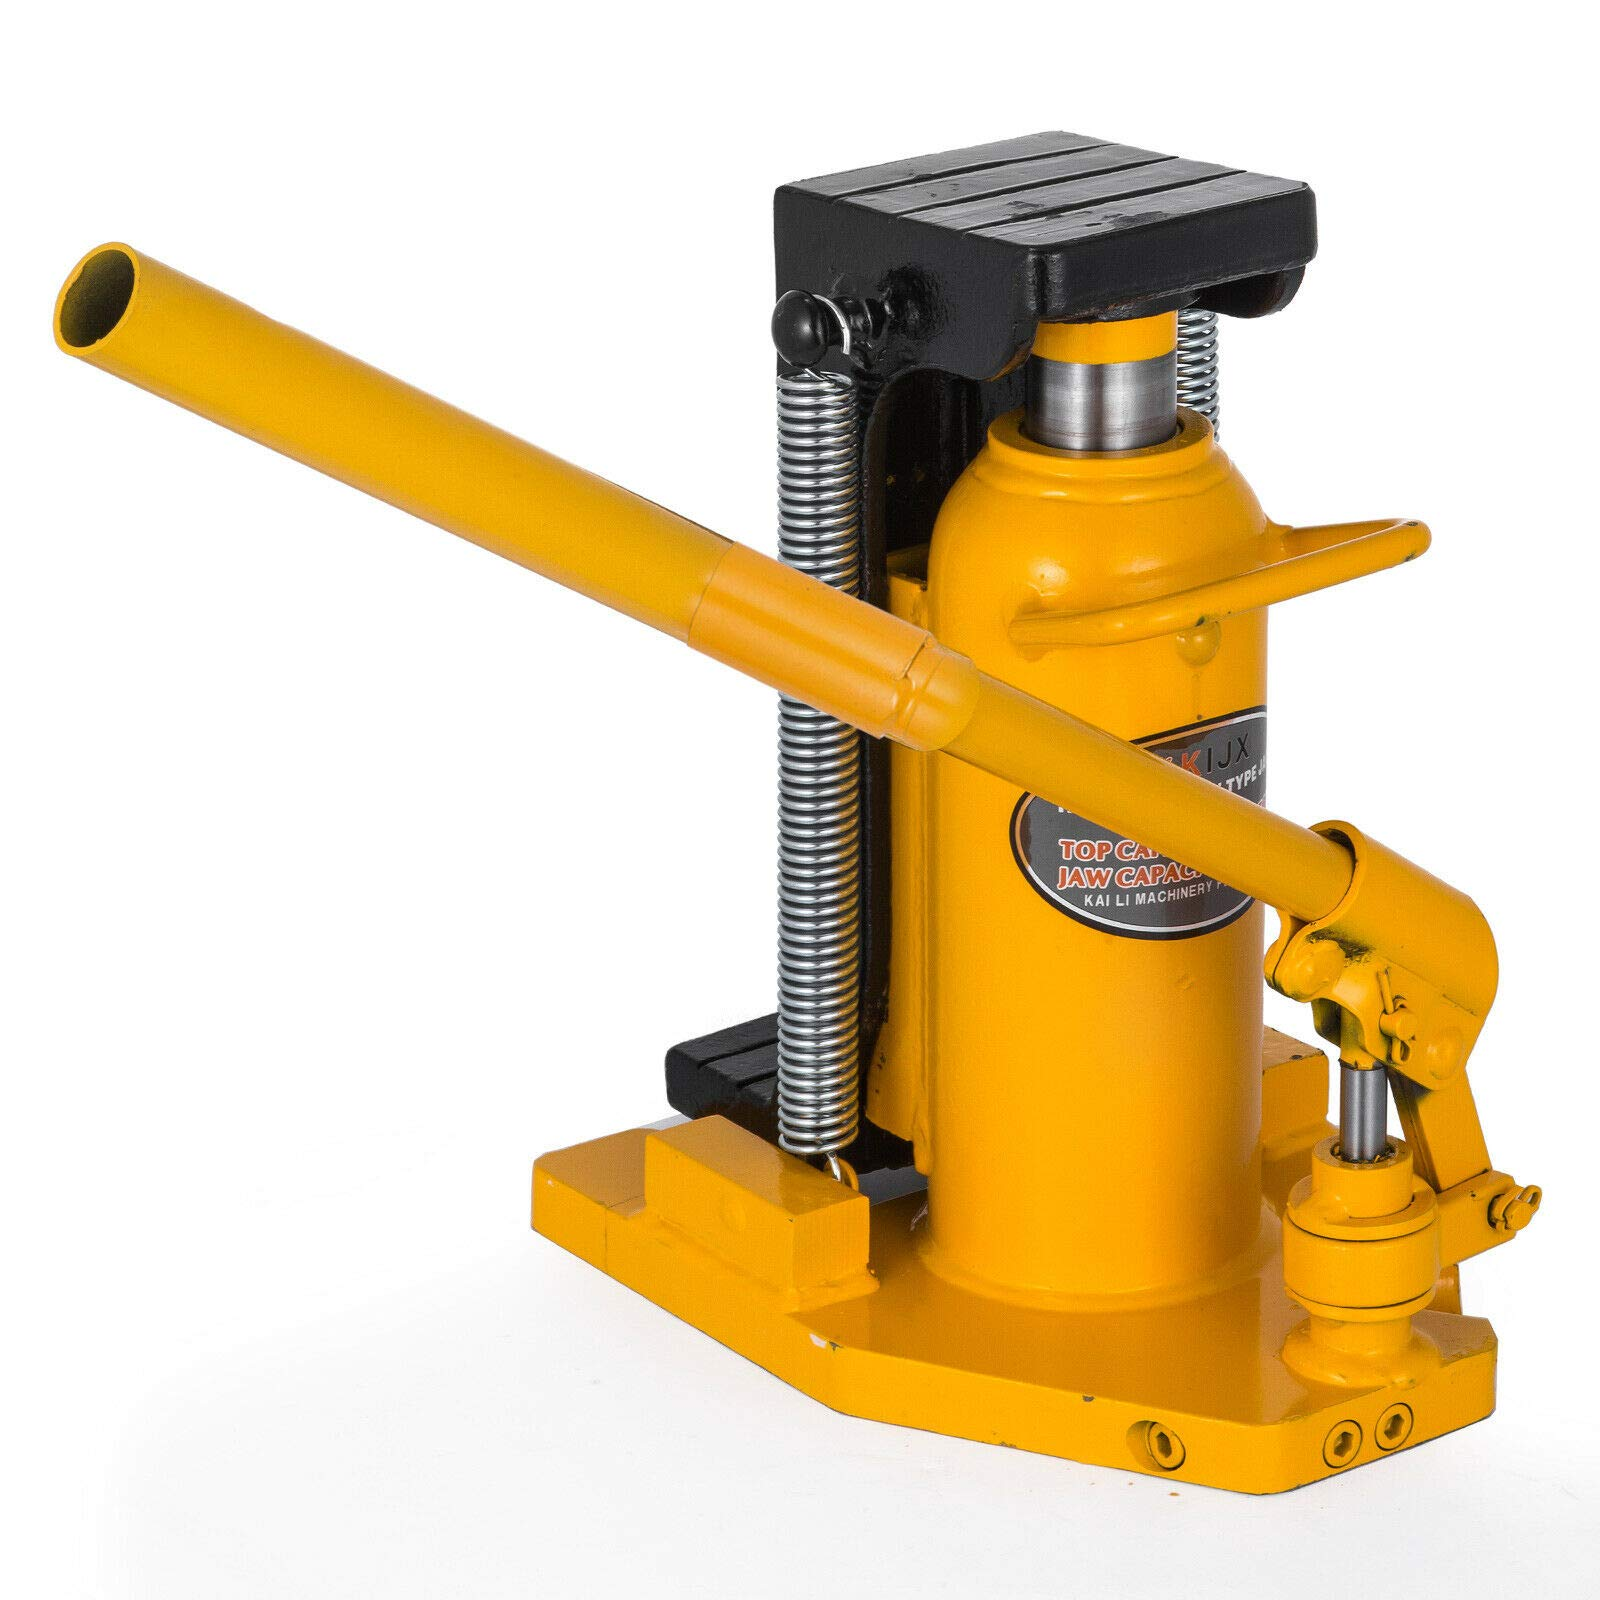 20 Ton Hydraulic Toe Jack Machine Lift Cylinder Equipment Proprietary Tools Home Improvement Garage Industrial Work Heavy Duty Steel Lifting Up Holder Welded Steel 13.7''12.5'' 9.8'' by Prettyshop4246